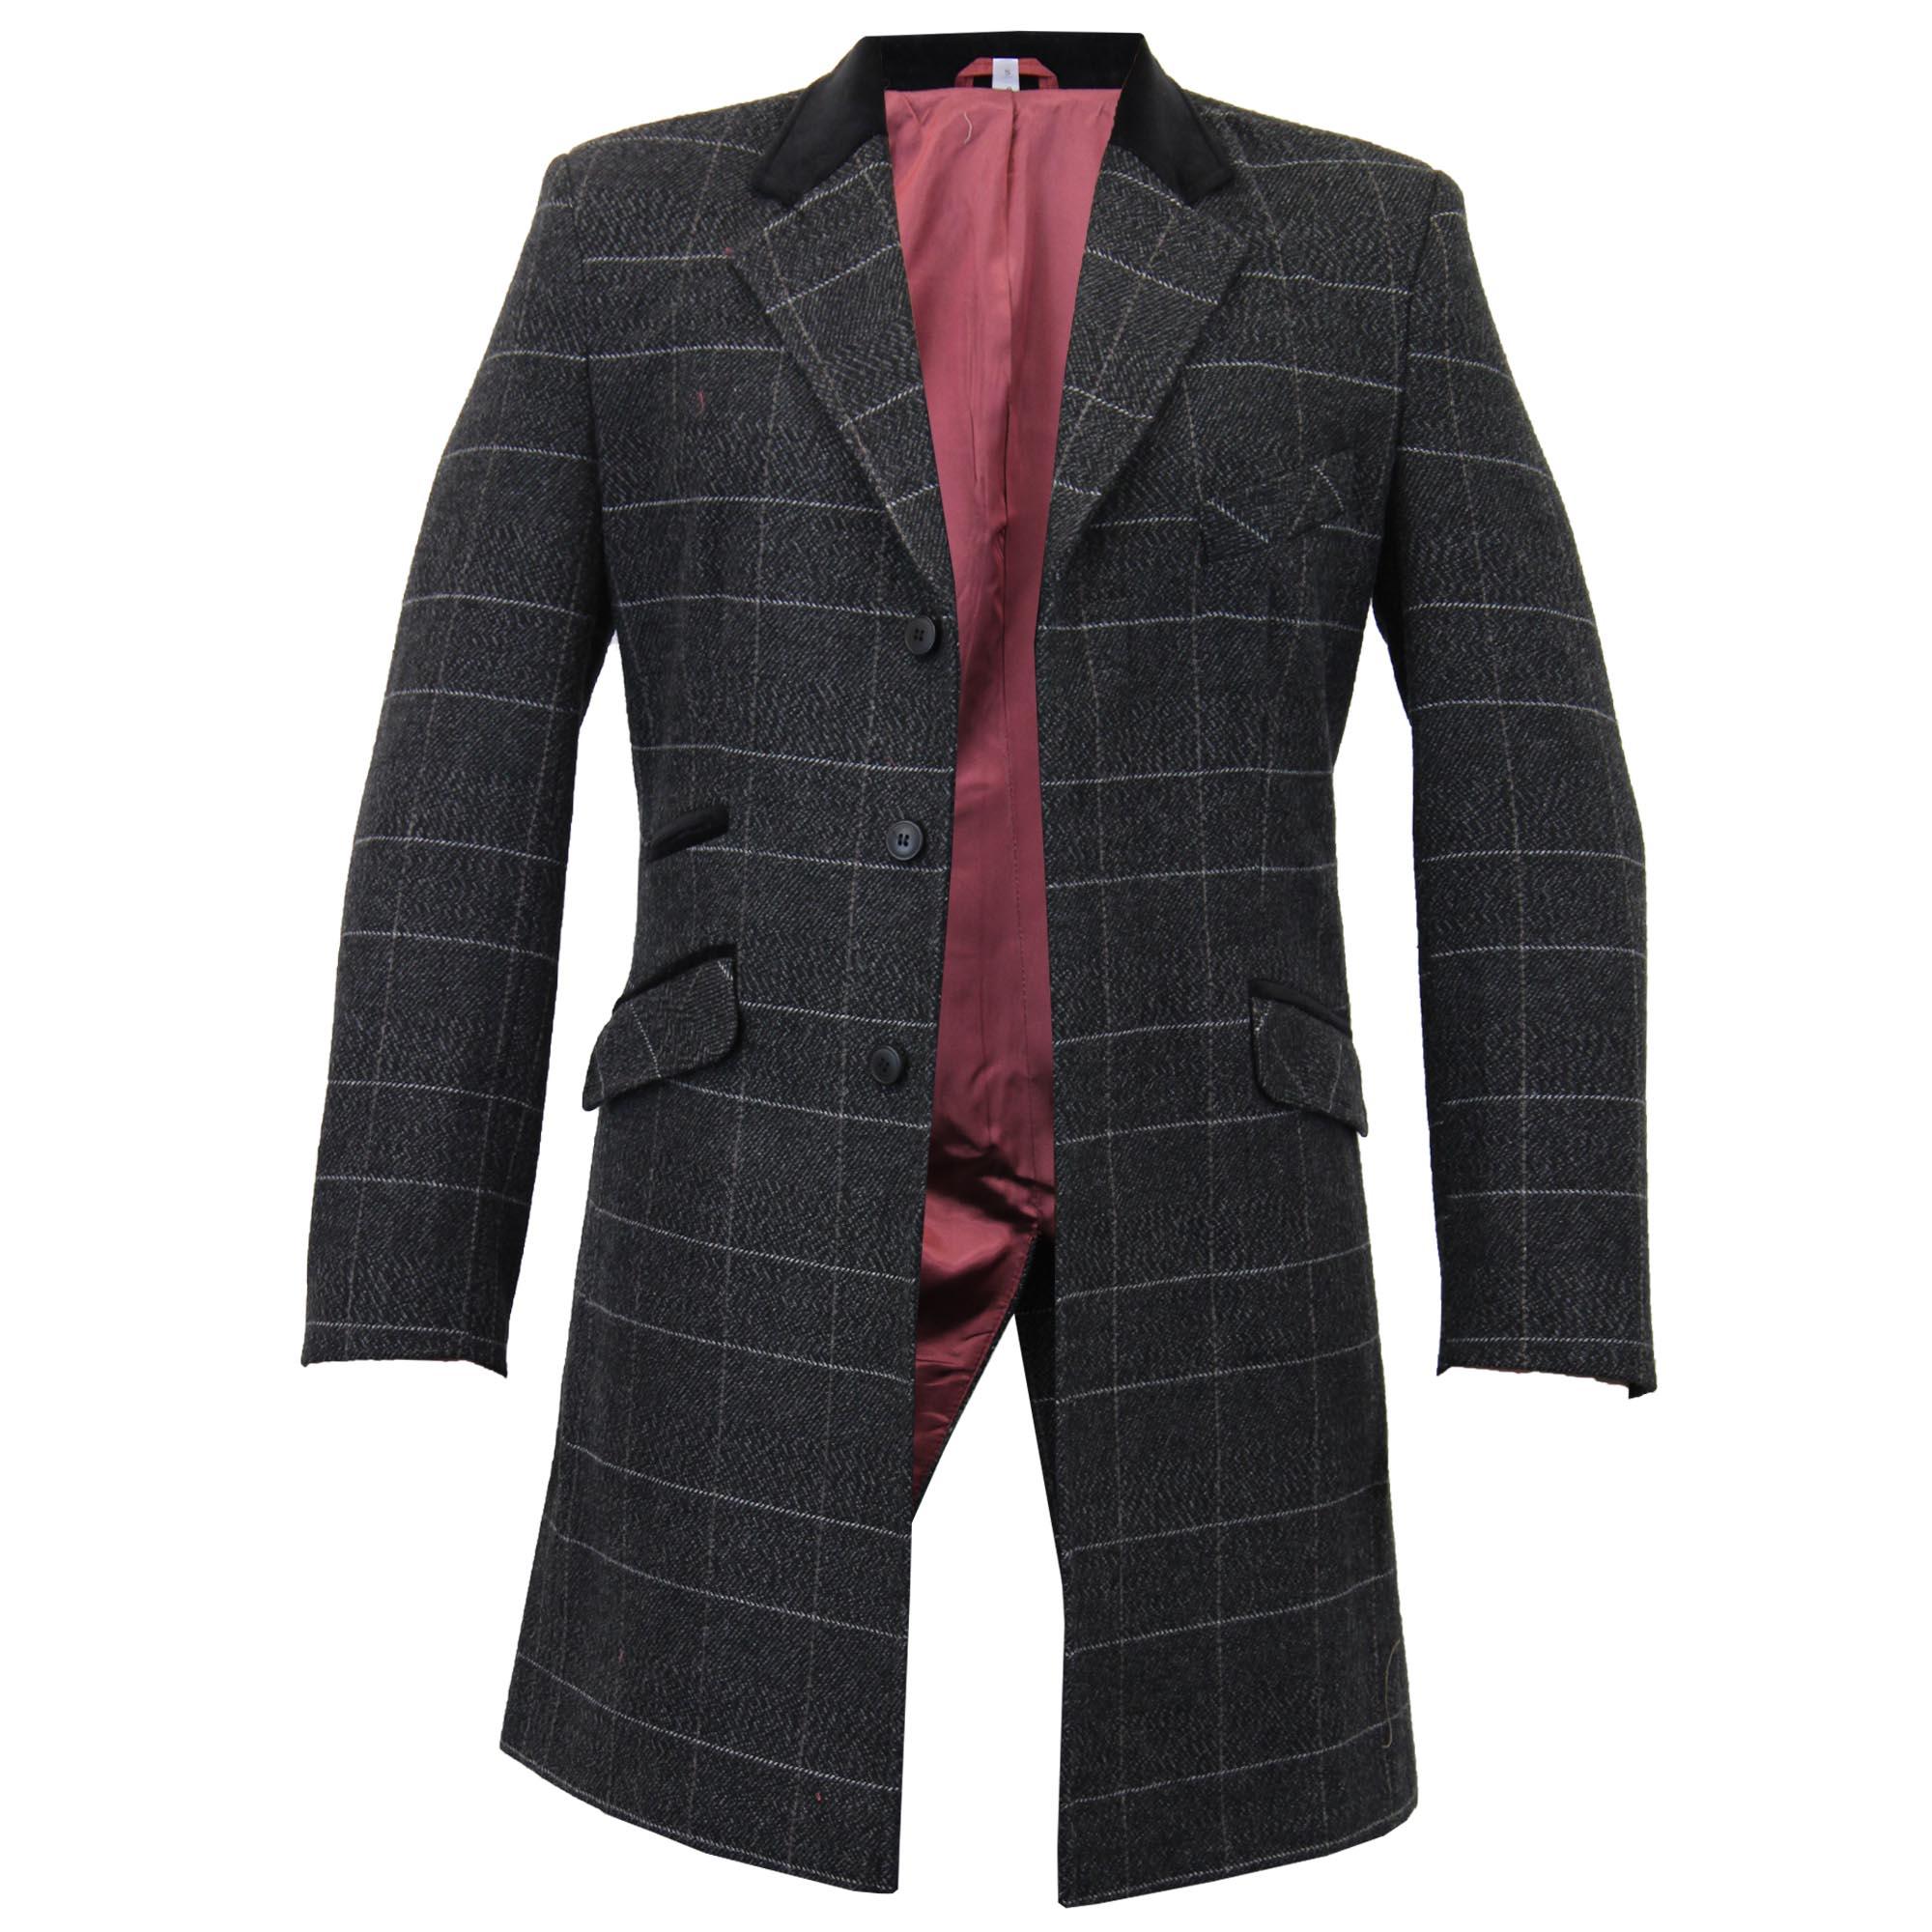 Mens-Wool-Mix-Trench-Coat-Checked-Jacket-Herringbone-Tweed-Overcoat-Lined-Winter thumbnail 4